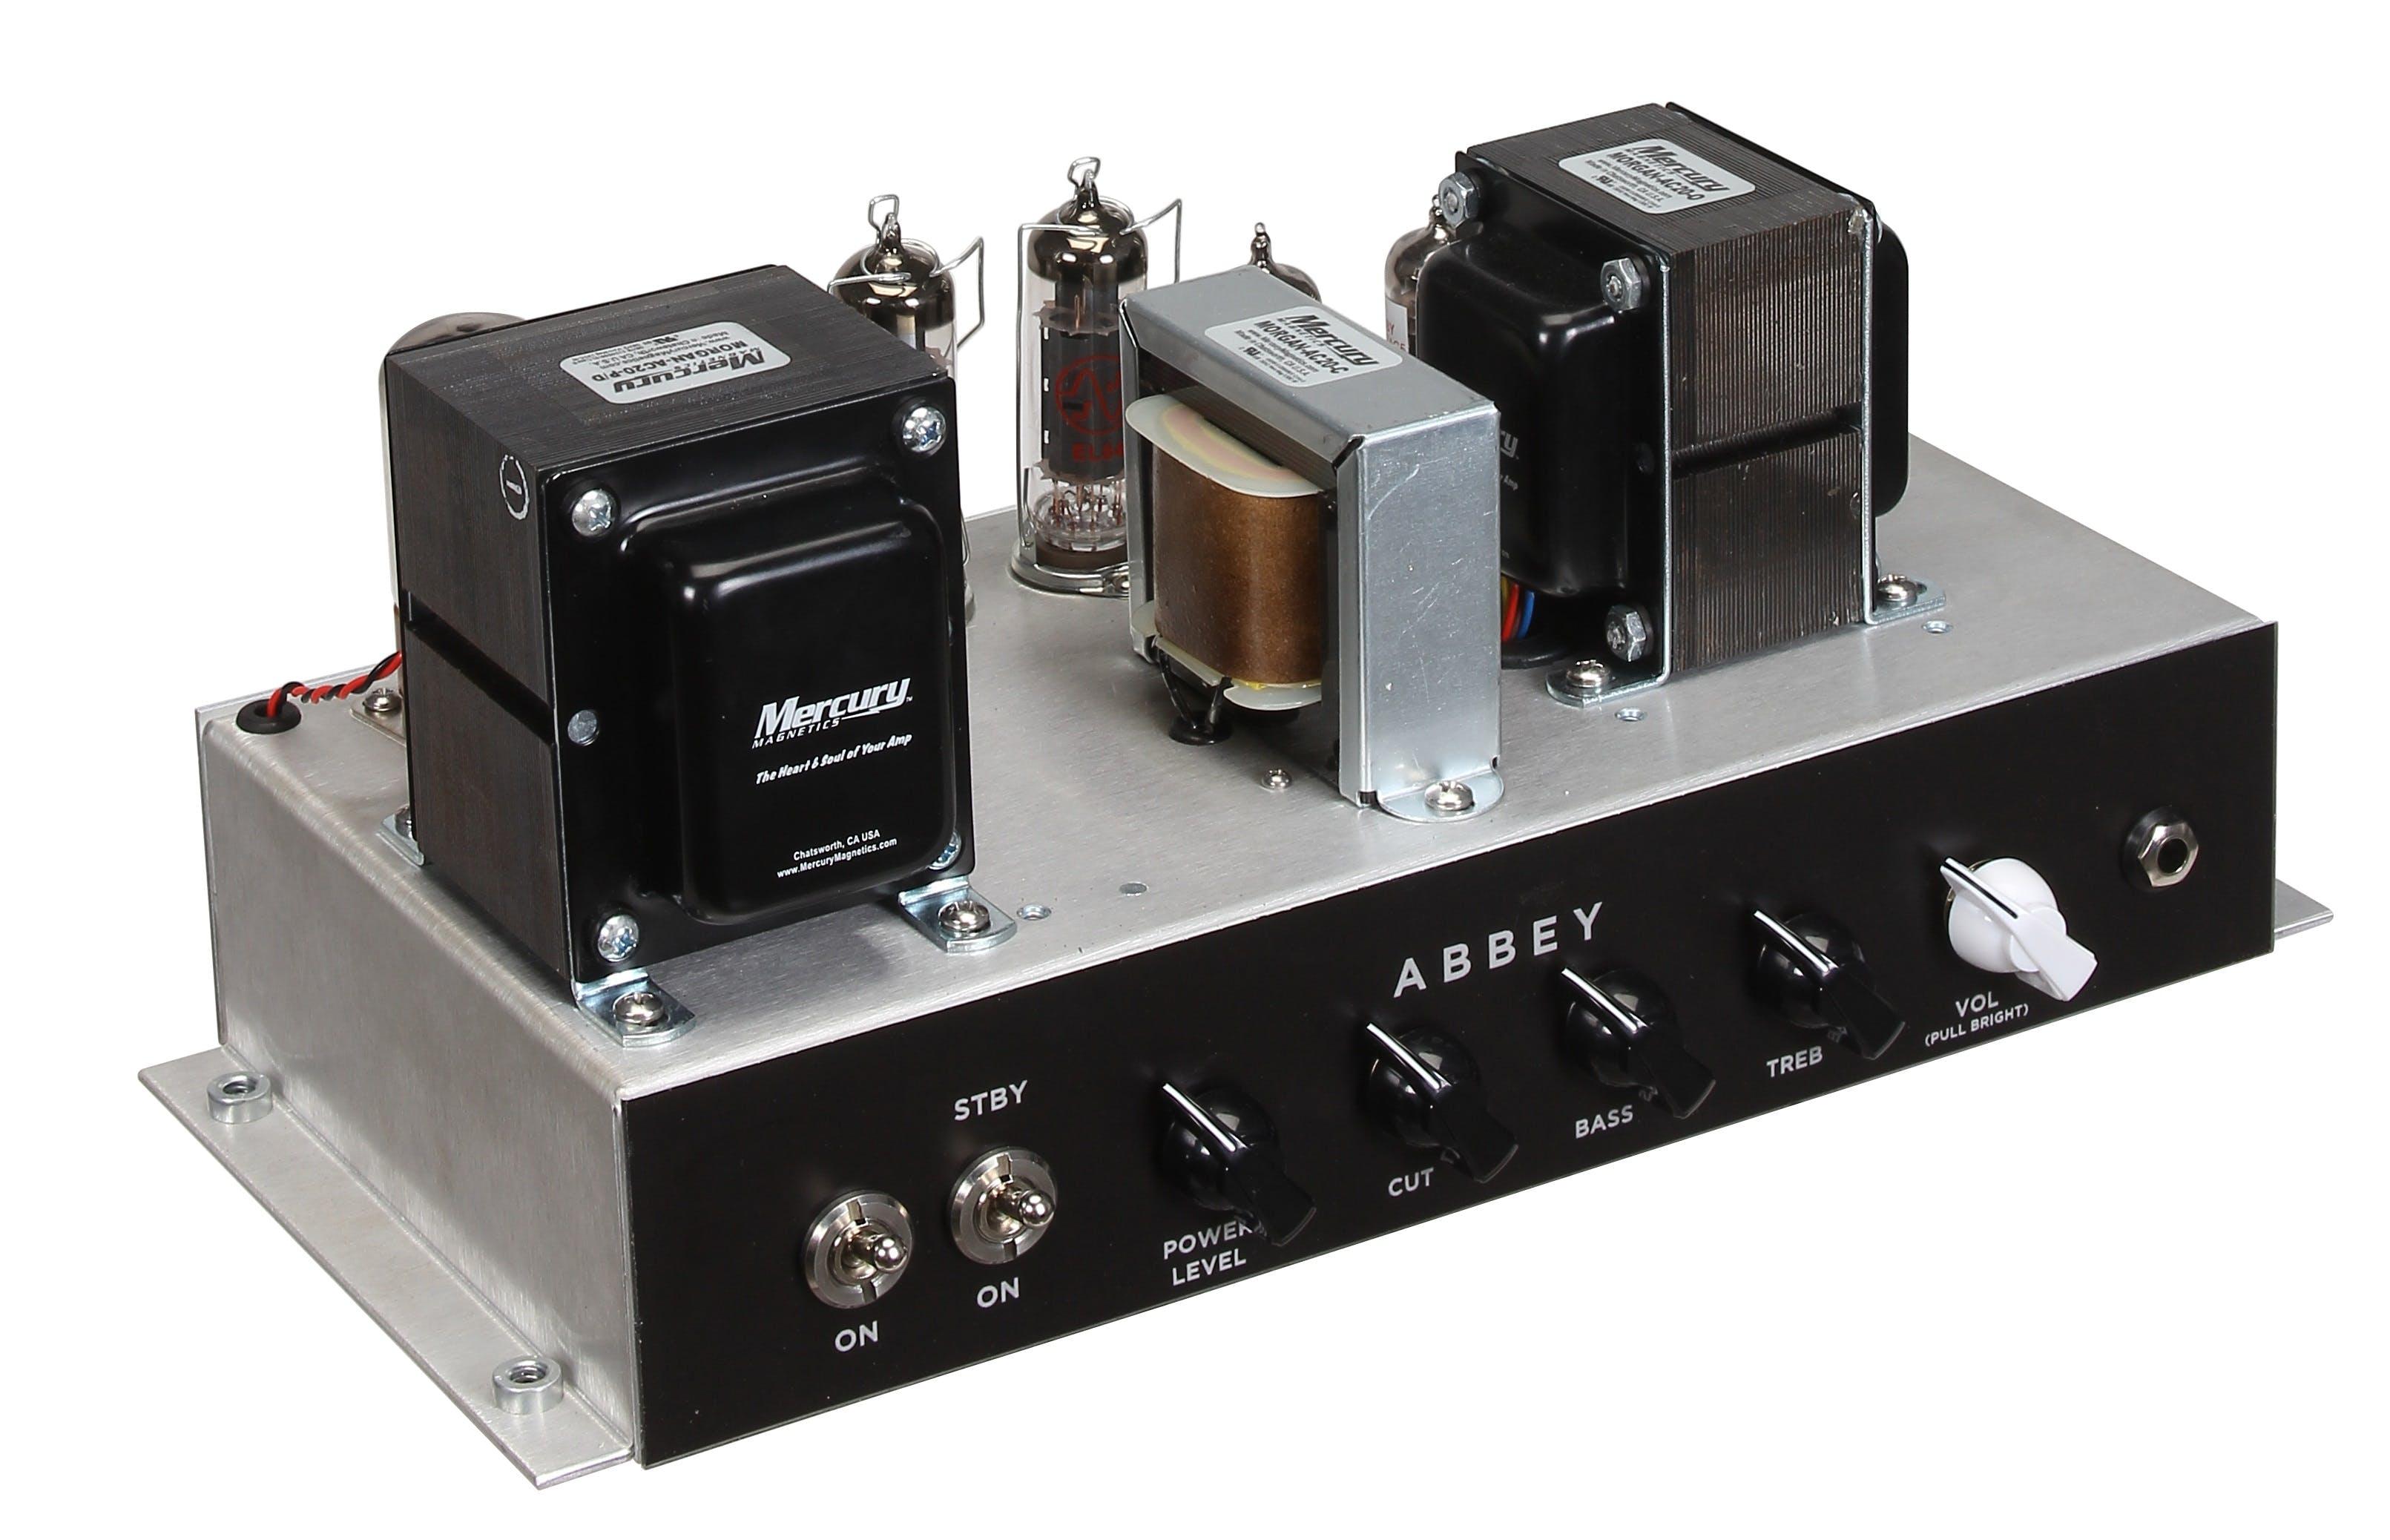 Morgan Abbey Head 20 Watt Power Scaled Top Boost Classic 23w Dual Audio Amplifier Circuit Andertons Music Co